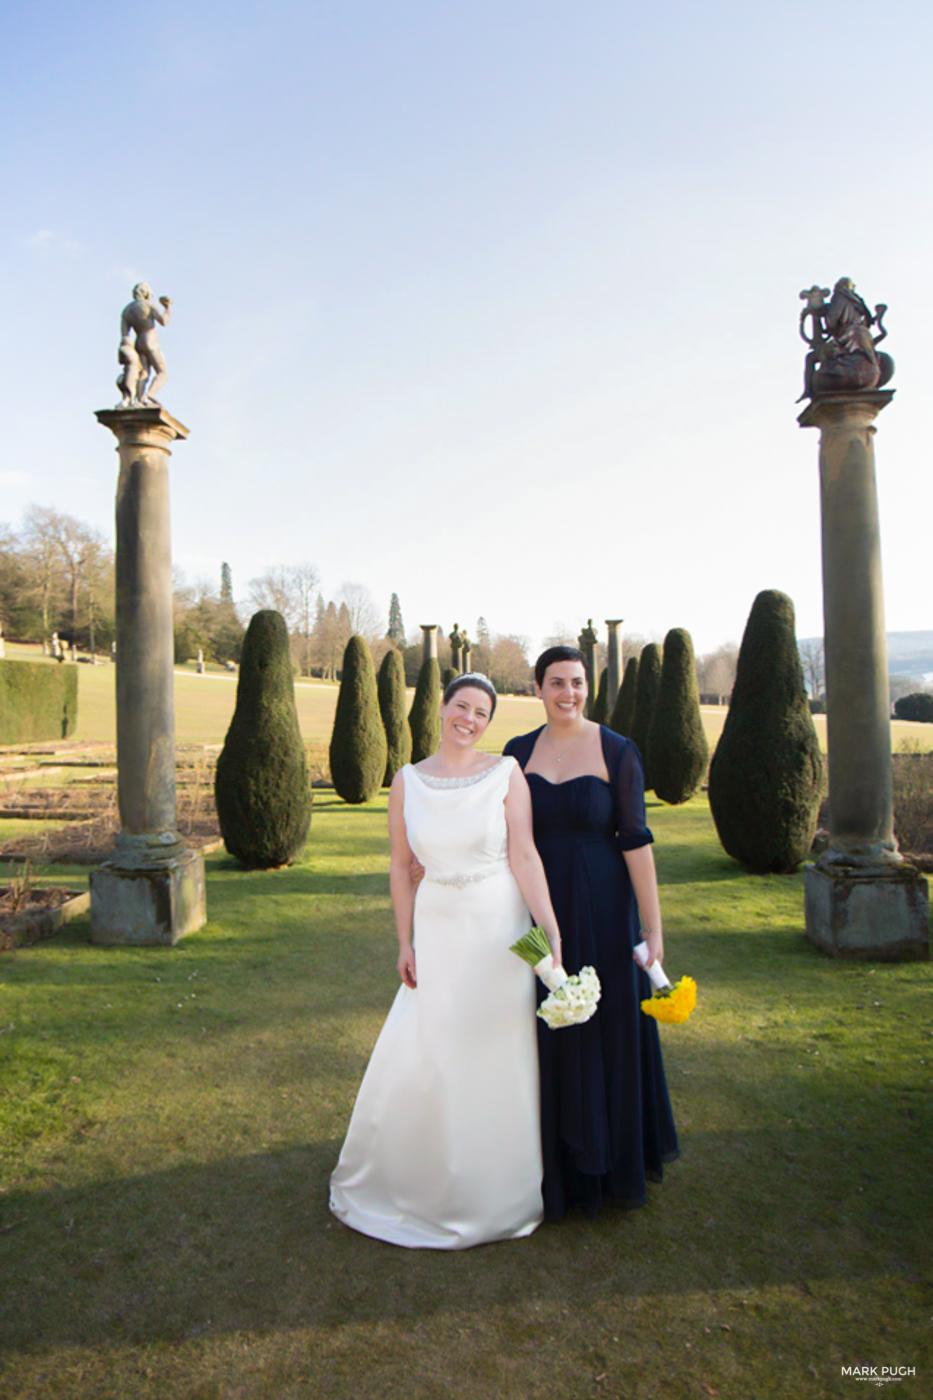 124  - Helen and Tim - Wedding Photography at Chatsworth House Bakewell Derbyshire DE45 1PP - Wedding Photographer Mark Pugh www.markpugh.com -193.JPG